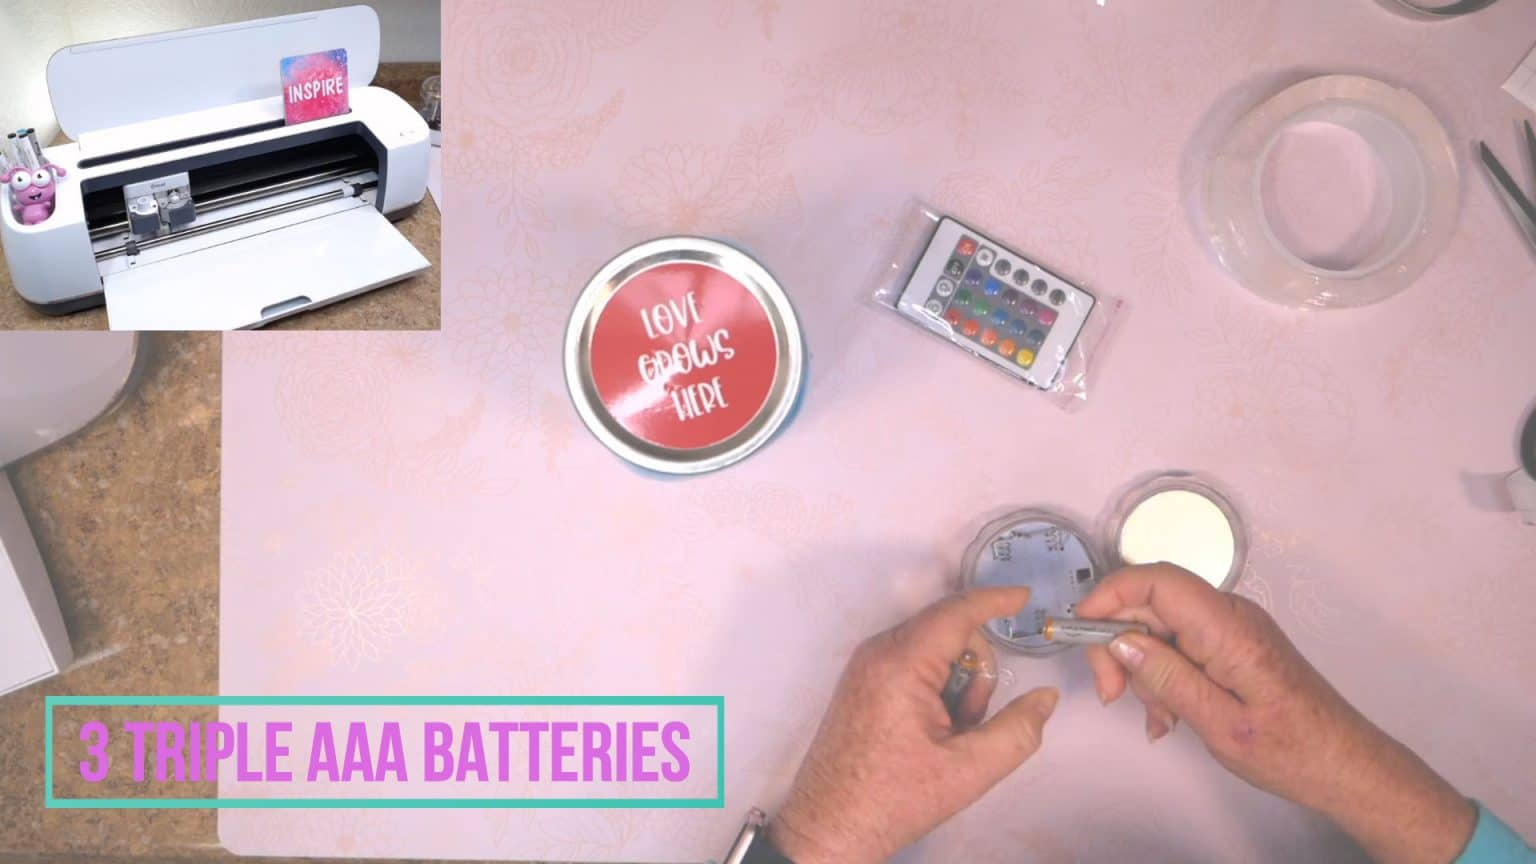 Add 3 AAA Triple Batteries to canning jar light